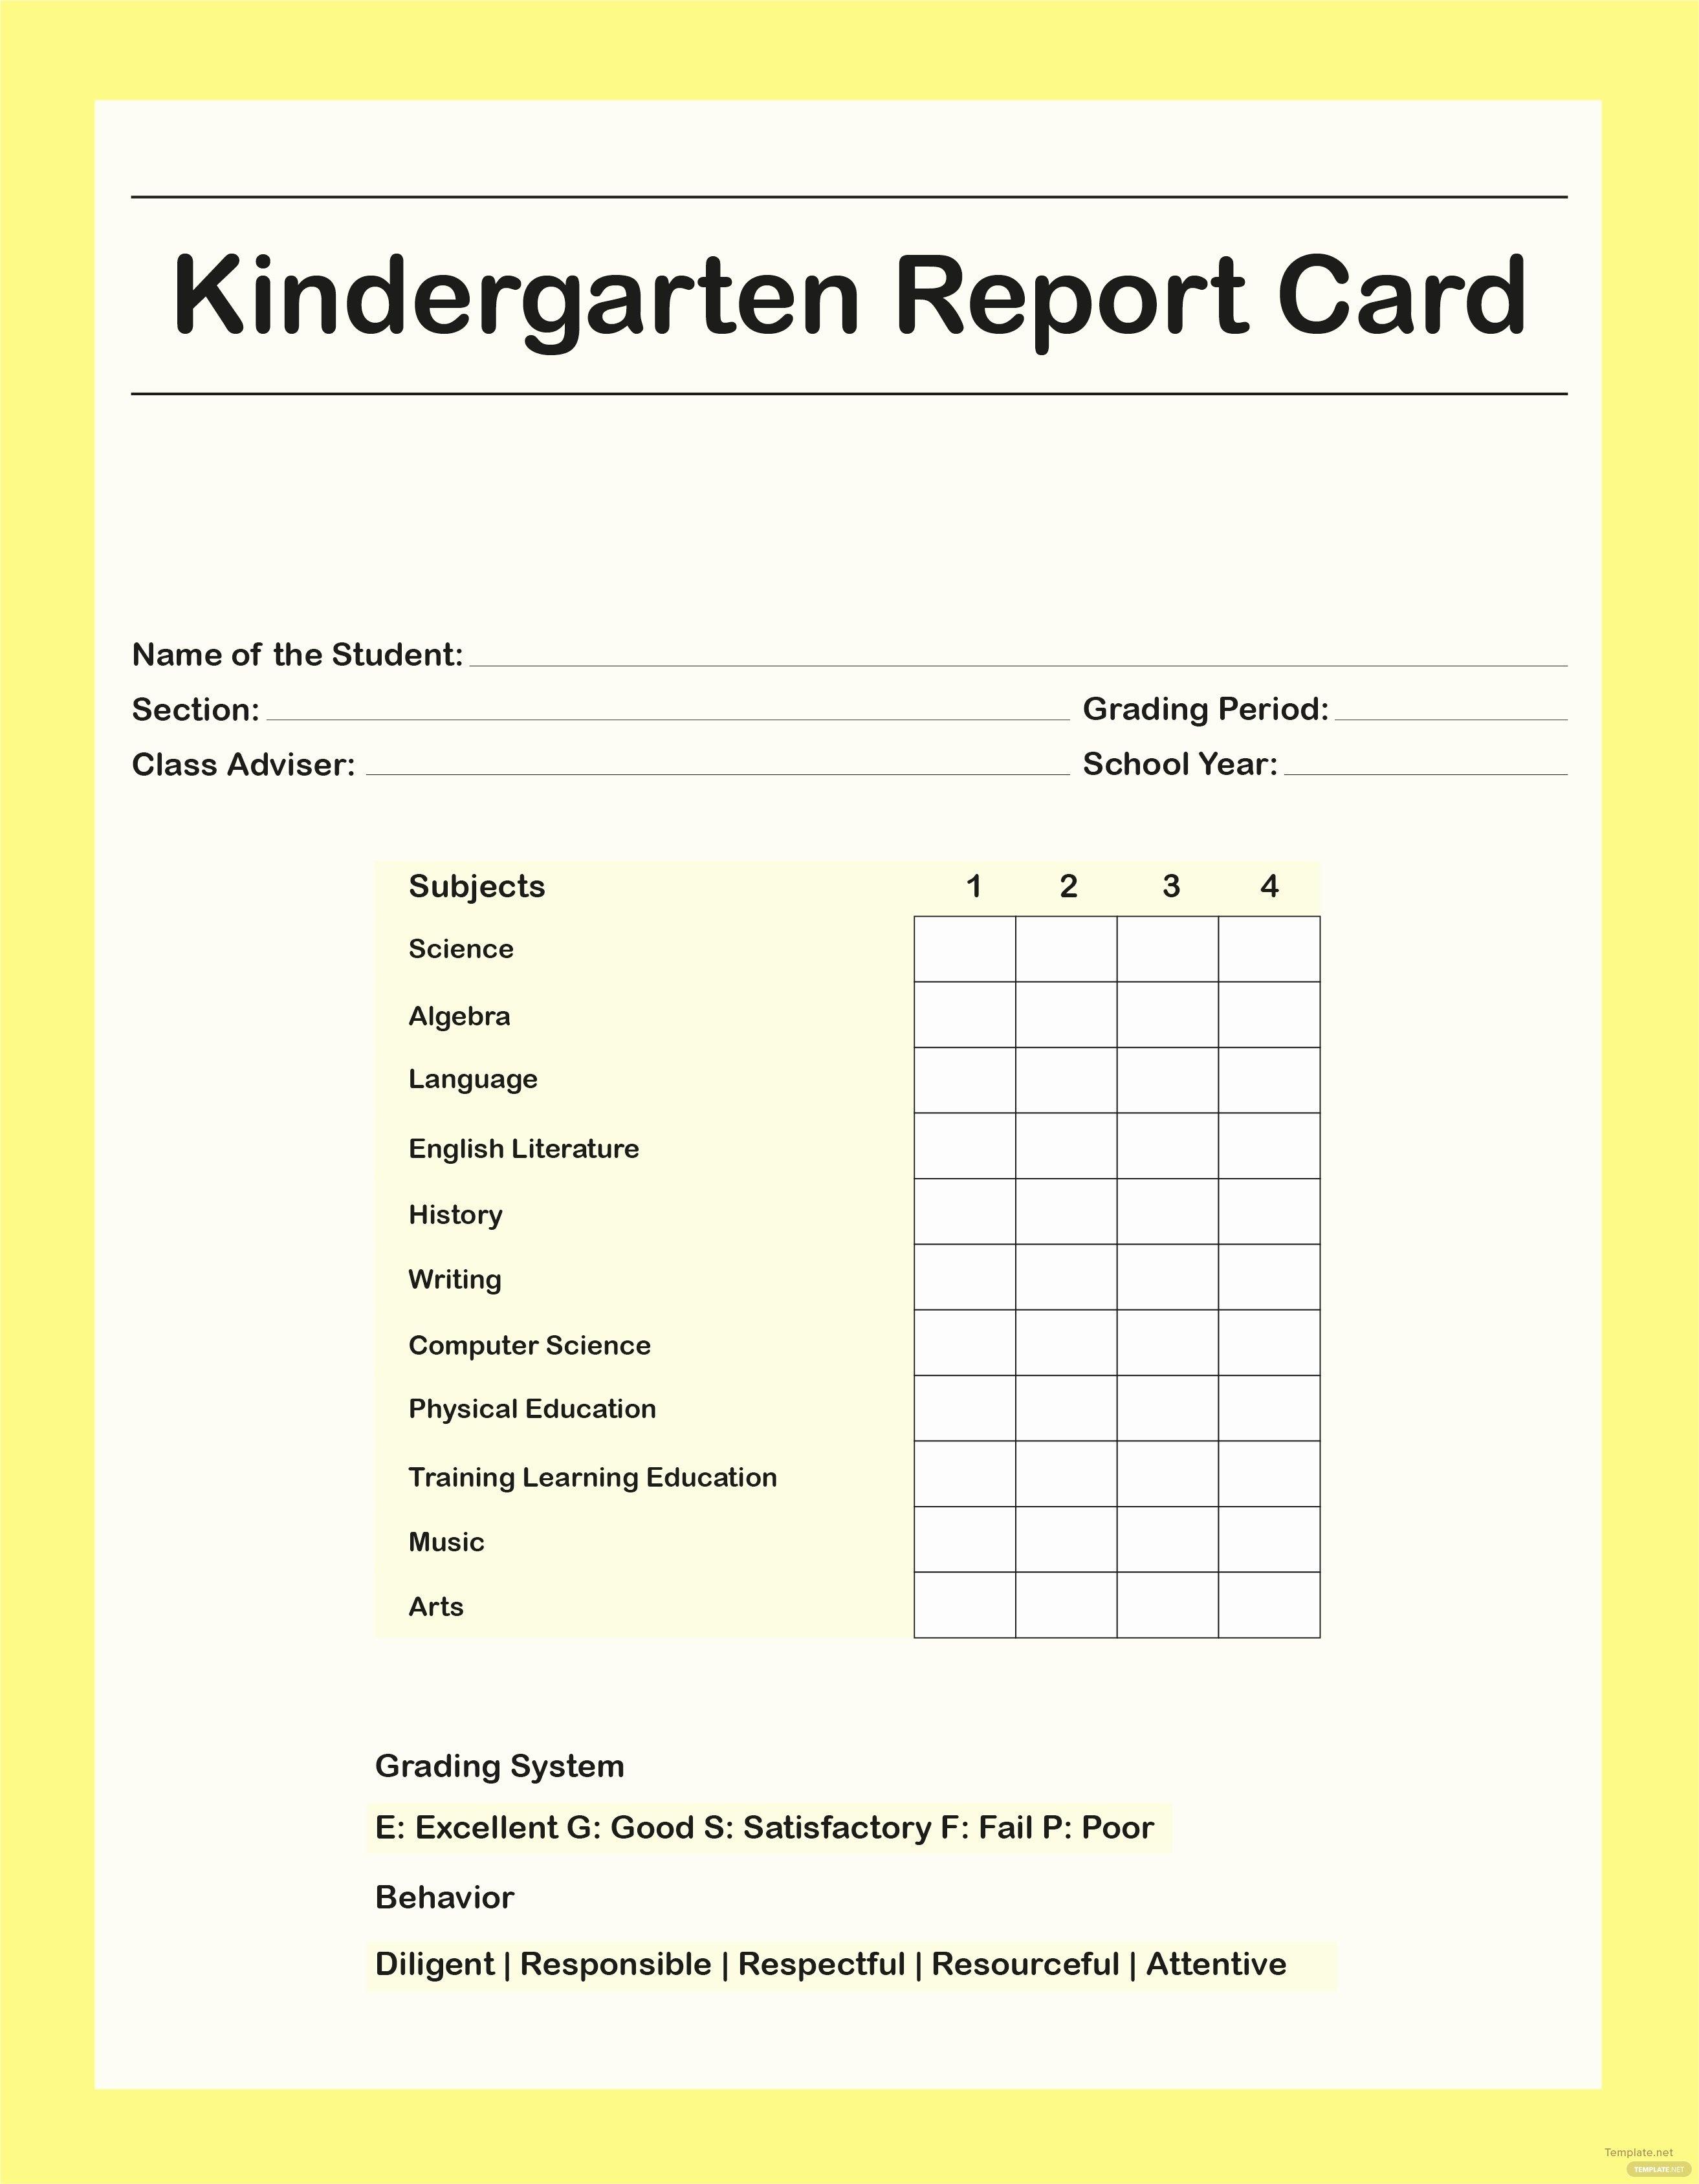 Free Report Card Template Blank Kindergarten Grooming   Meetpaulryan - Free Printable Kindergarten Report Cards